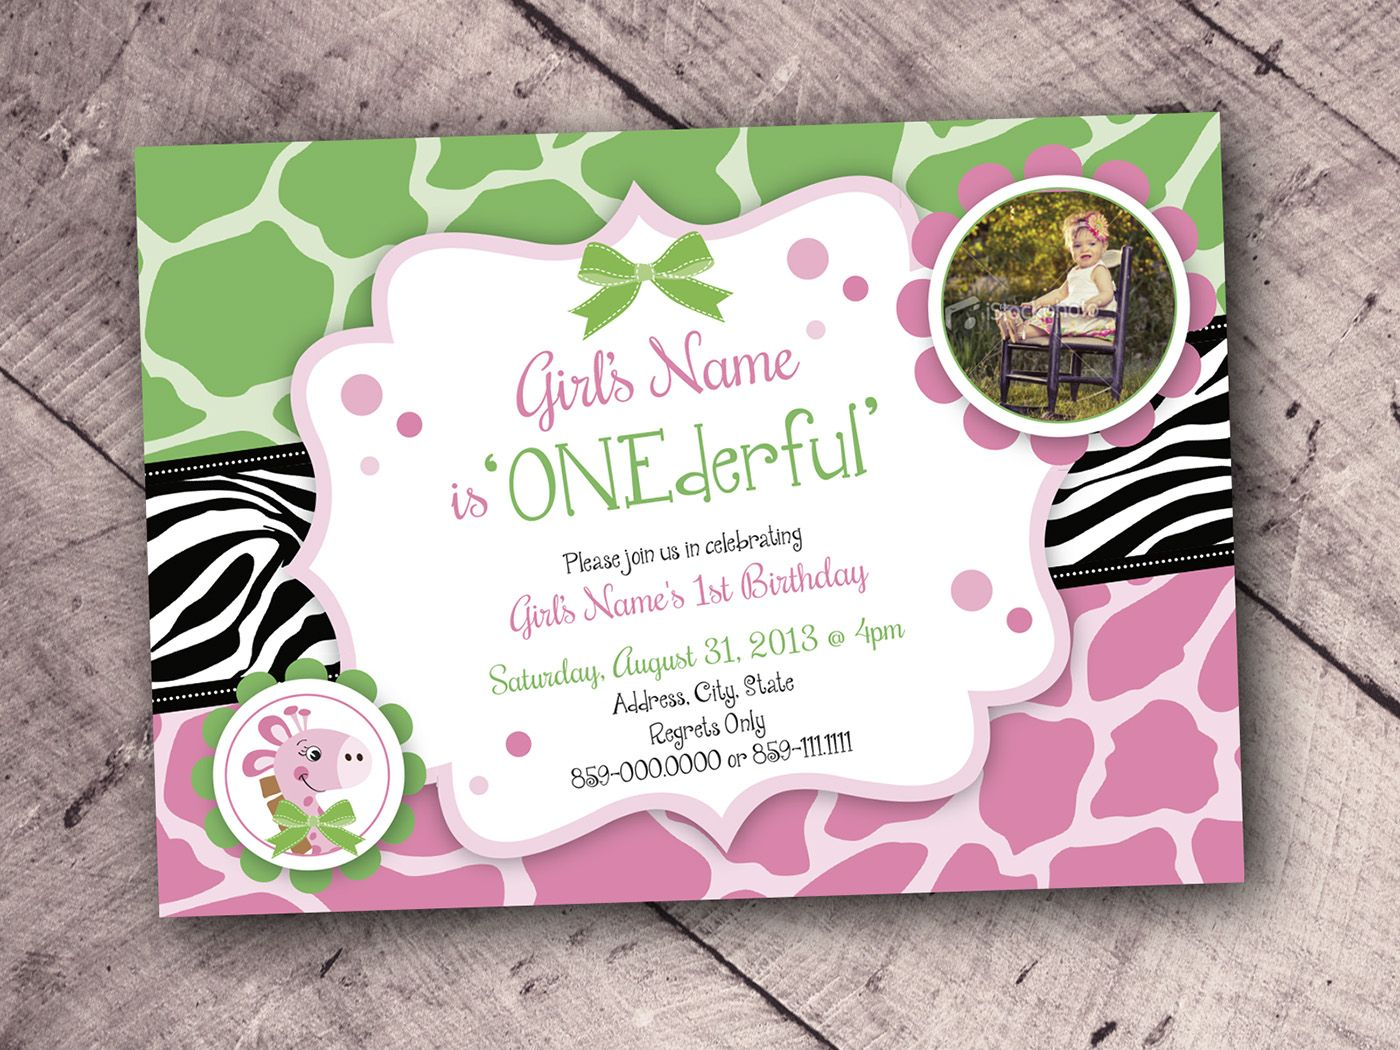 One Year Old Girl Birthday Invitation Design-Animal Print Theme Pink ...